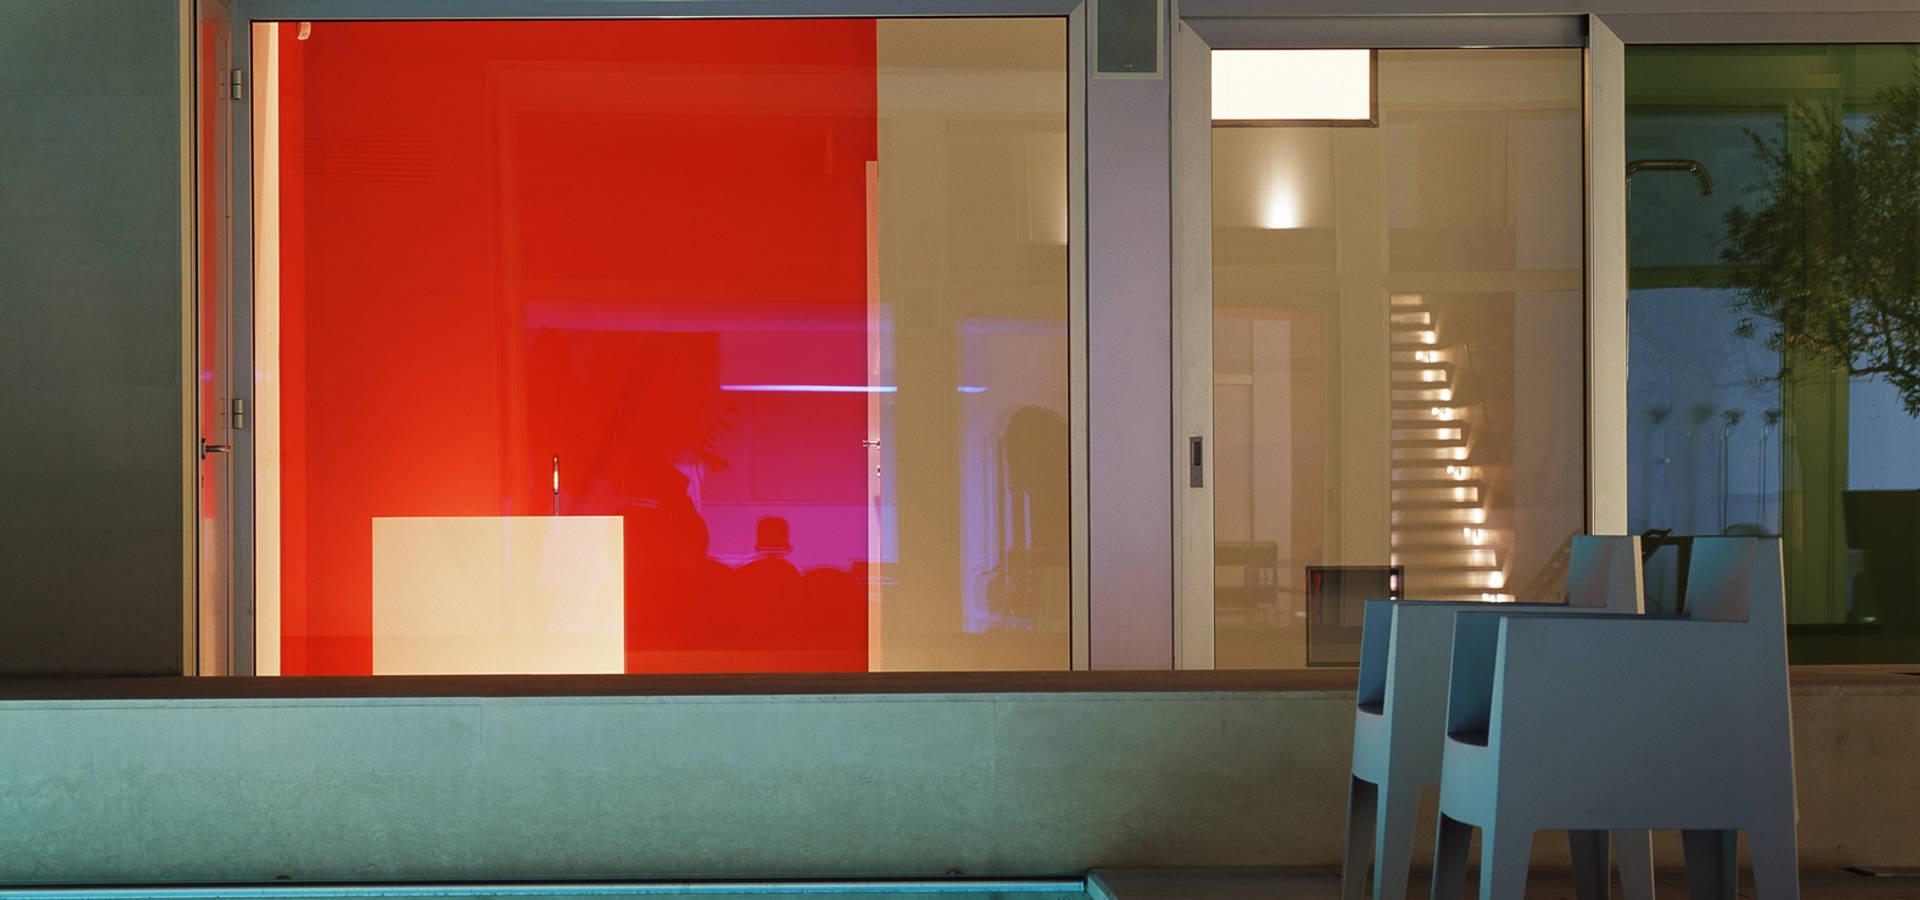 Buratti + Battiston Architects